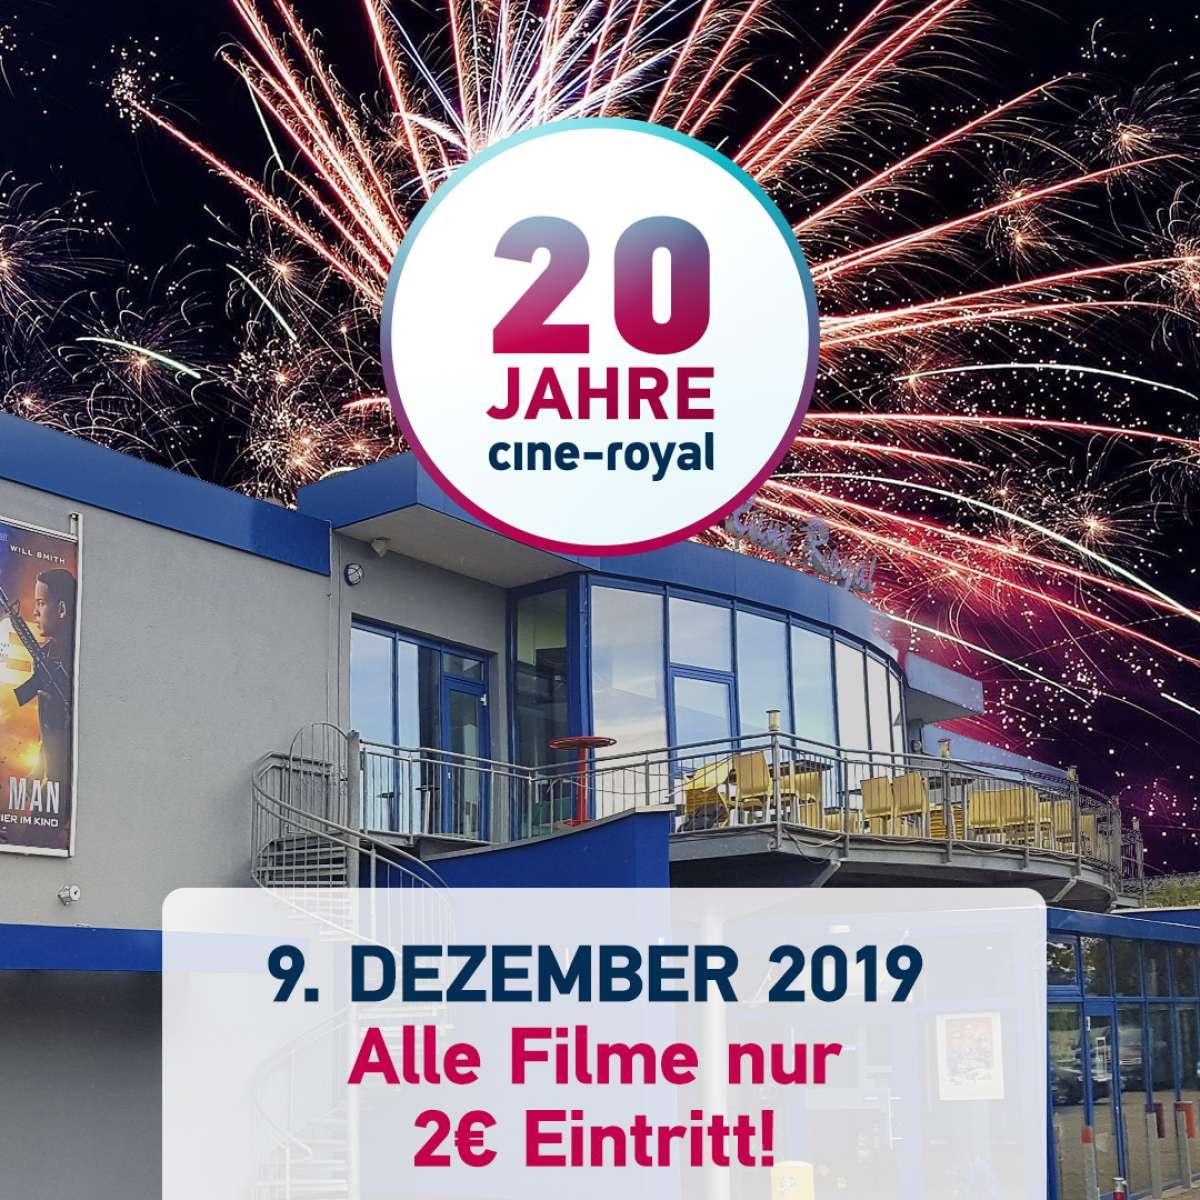 20 Jahre Cine Royal - Cine-Royal  - Fritzlar